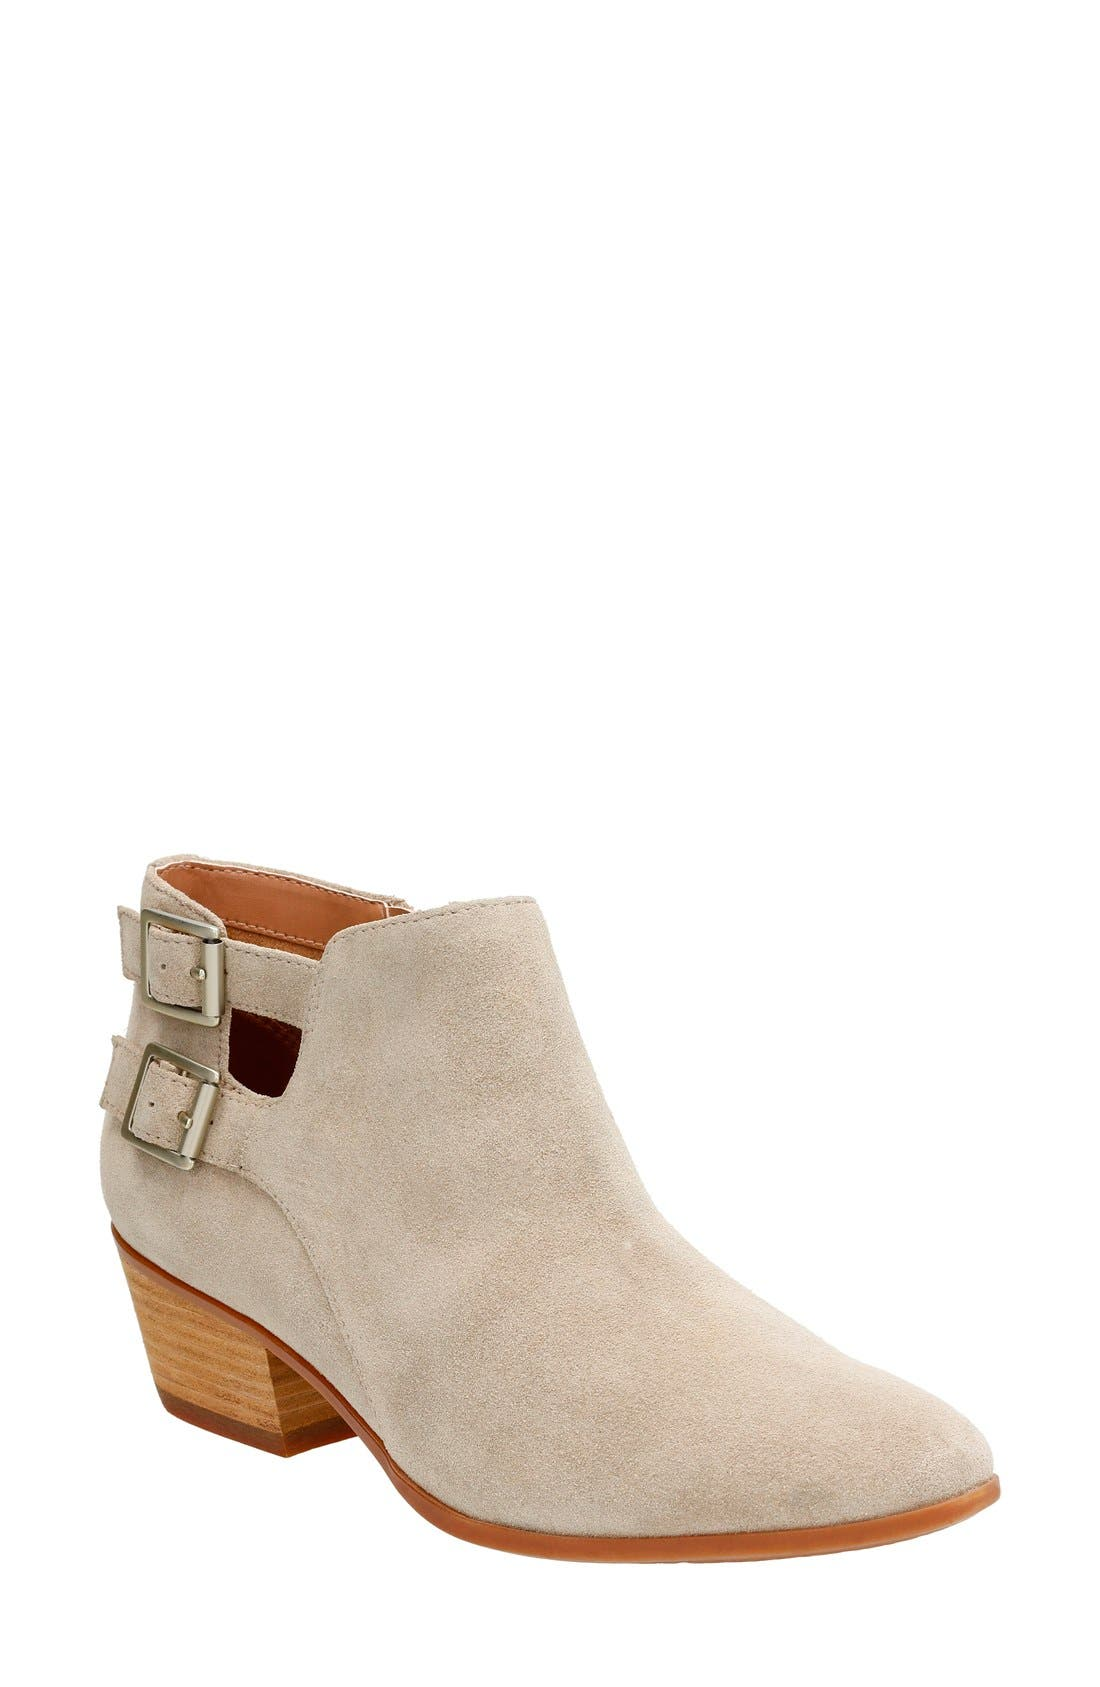 Main Image - Clarks® 'Spye Astro' Boot (Women)